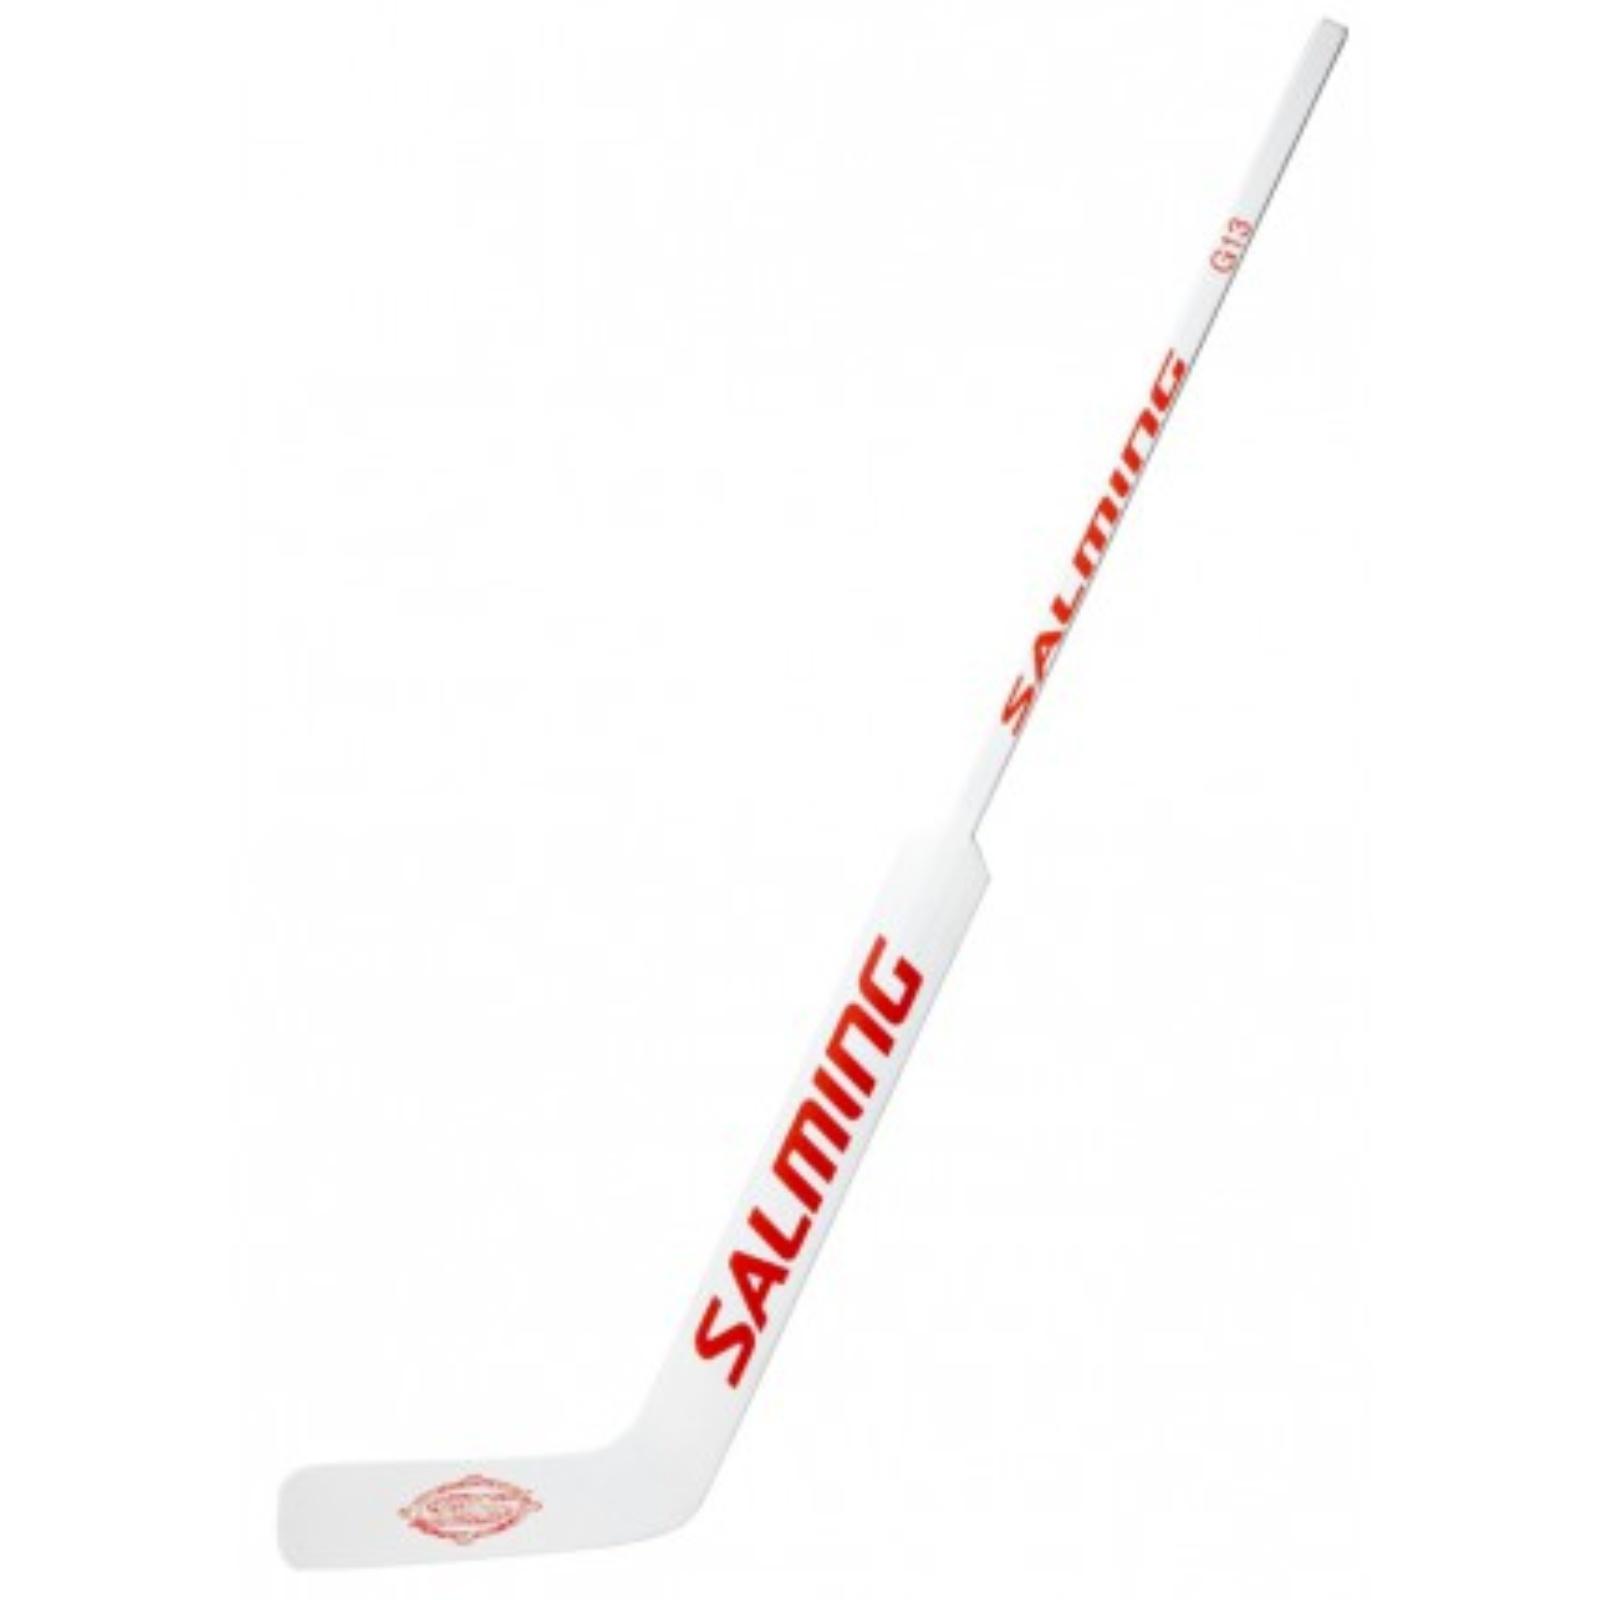 Brankárska hokejka SALMING GM13 LIV Goalie Stick, ľavá 69